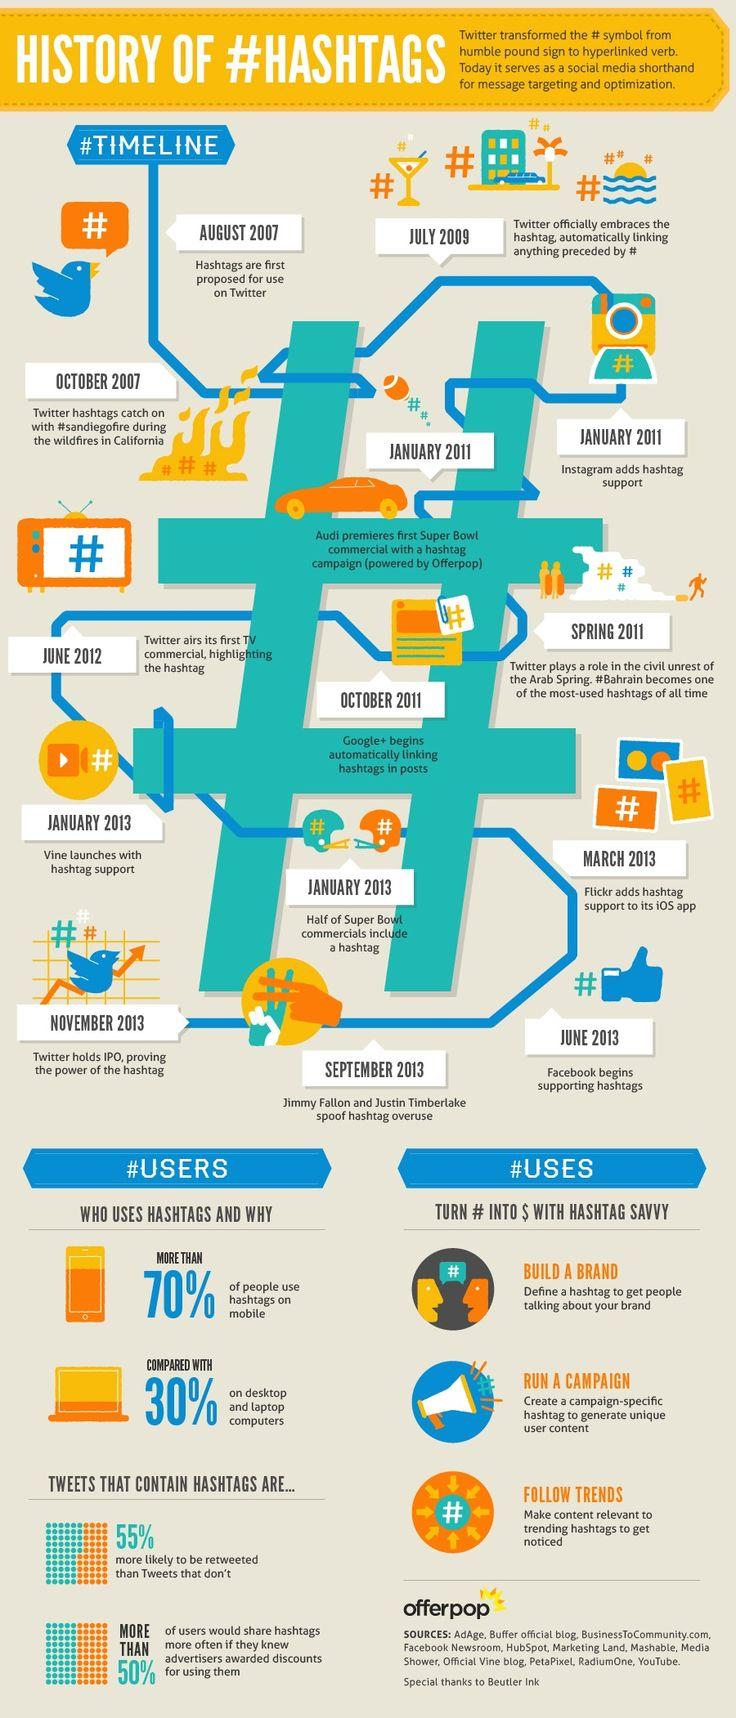 Social Media - The History of Hashtags [Infographic] : MarketingProfs Article - Nov 19, 2013